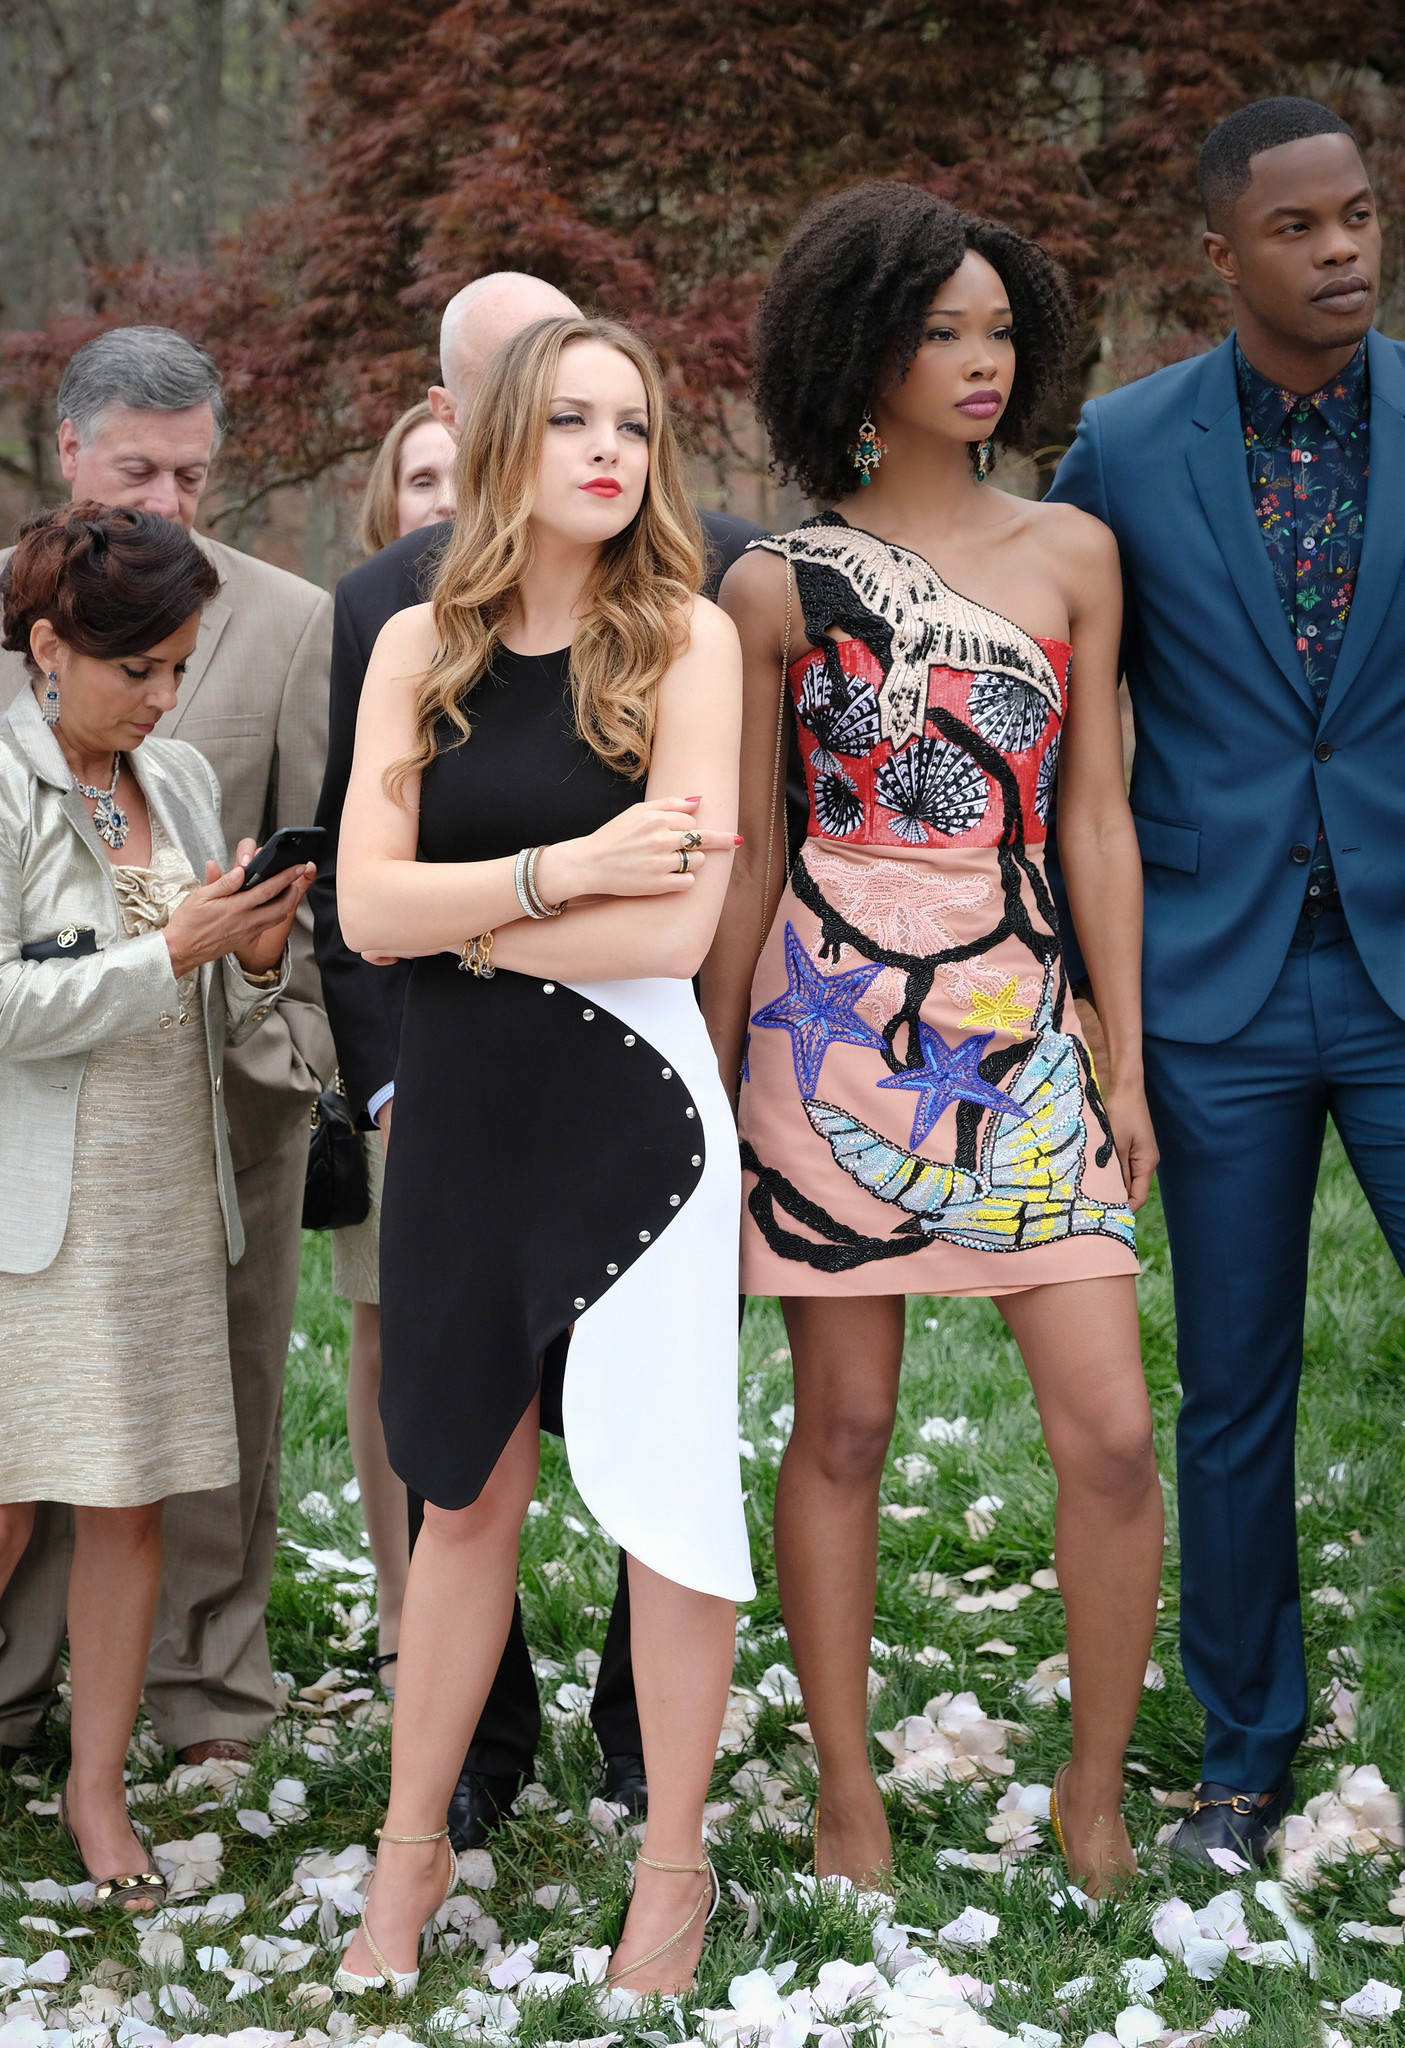 Elizabeth Gillies as Fallon, Wakeema Hollis as Monica and Sam Adegoke as Jeff in a scene from the CW's 'Dynasty